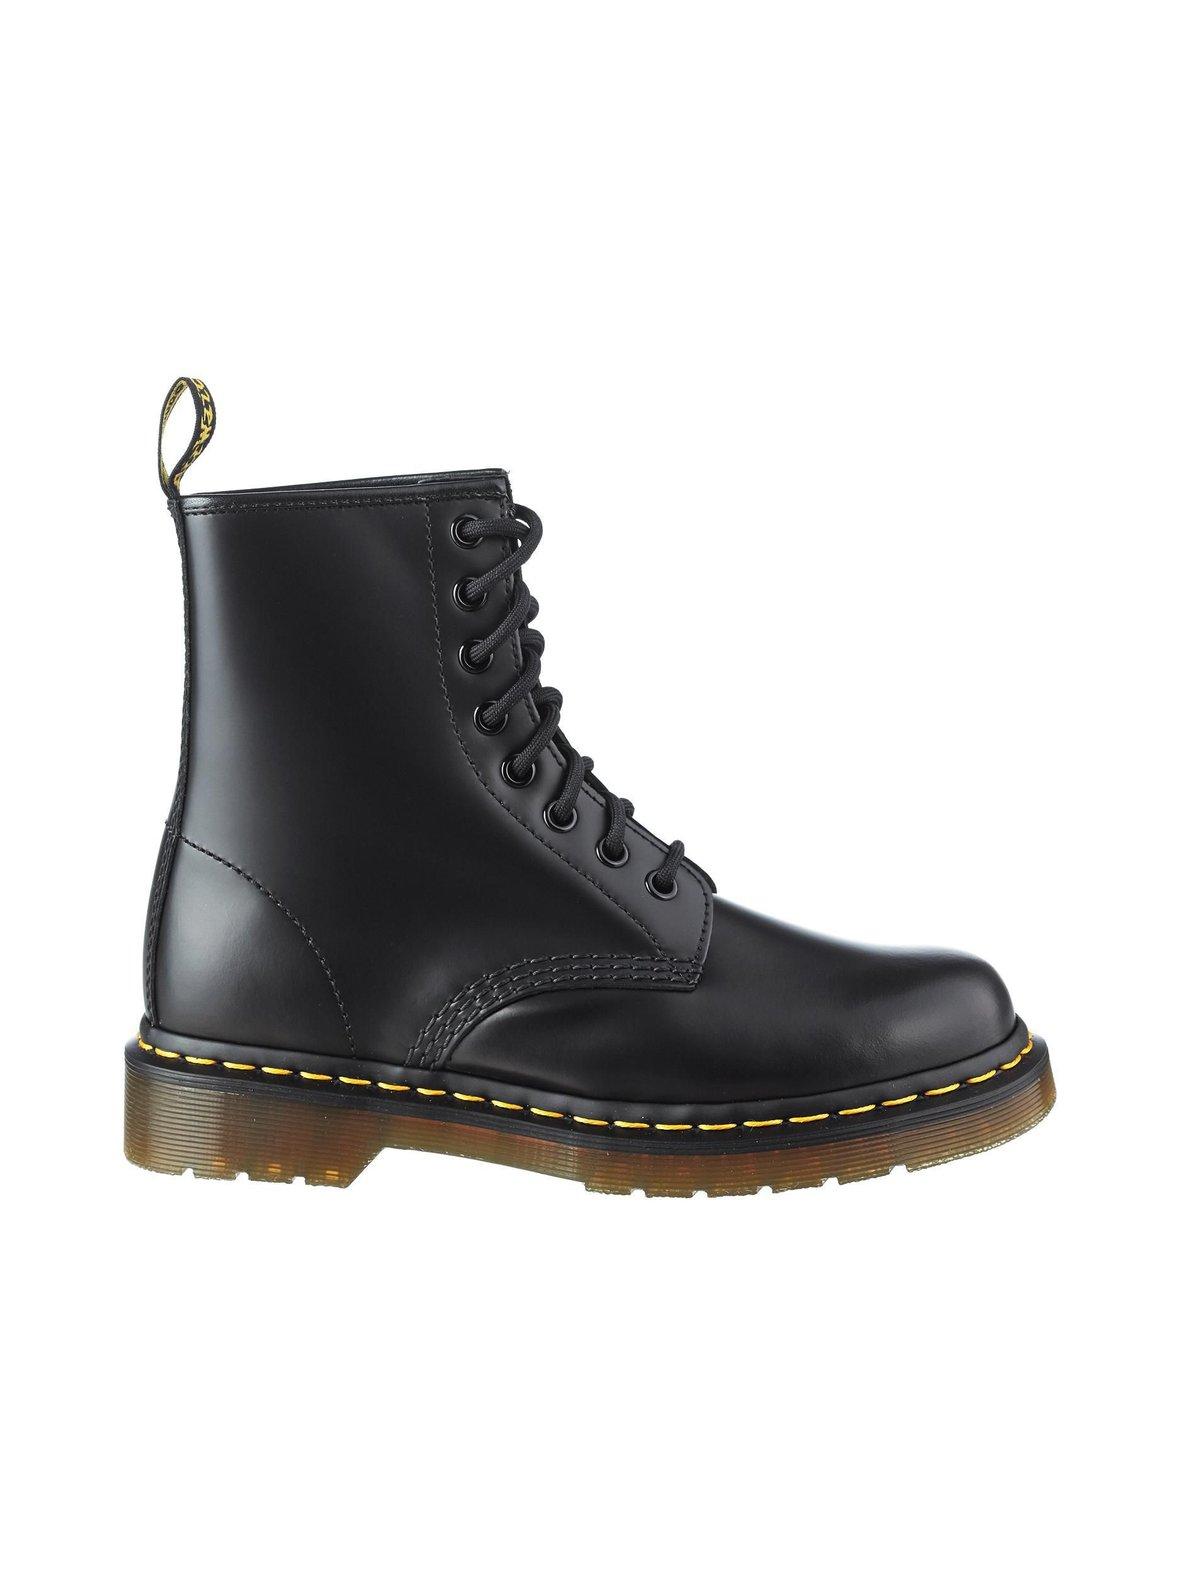 Black (musta) Dr. Martens 1460-saappaat 11822006  f676edee24